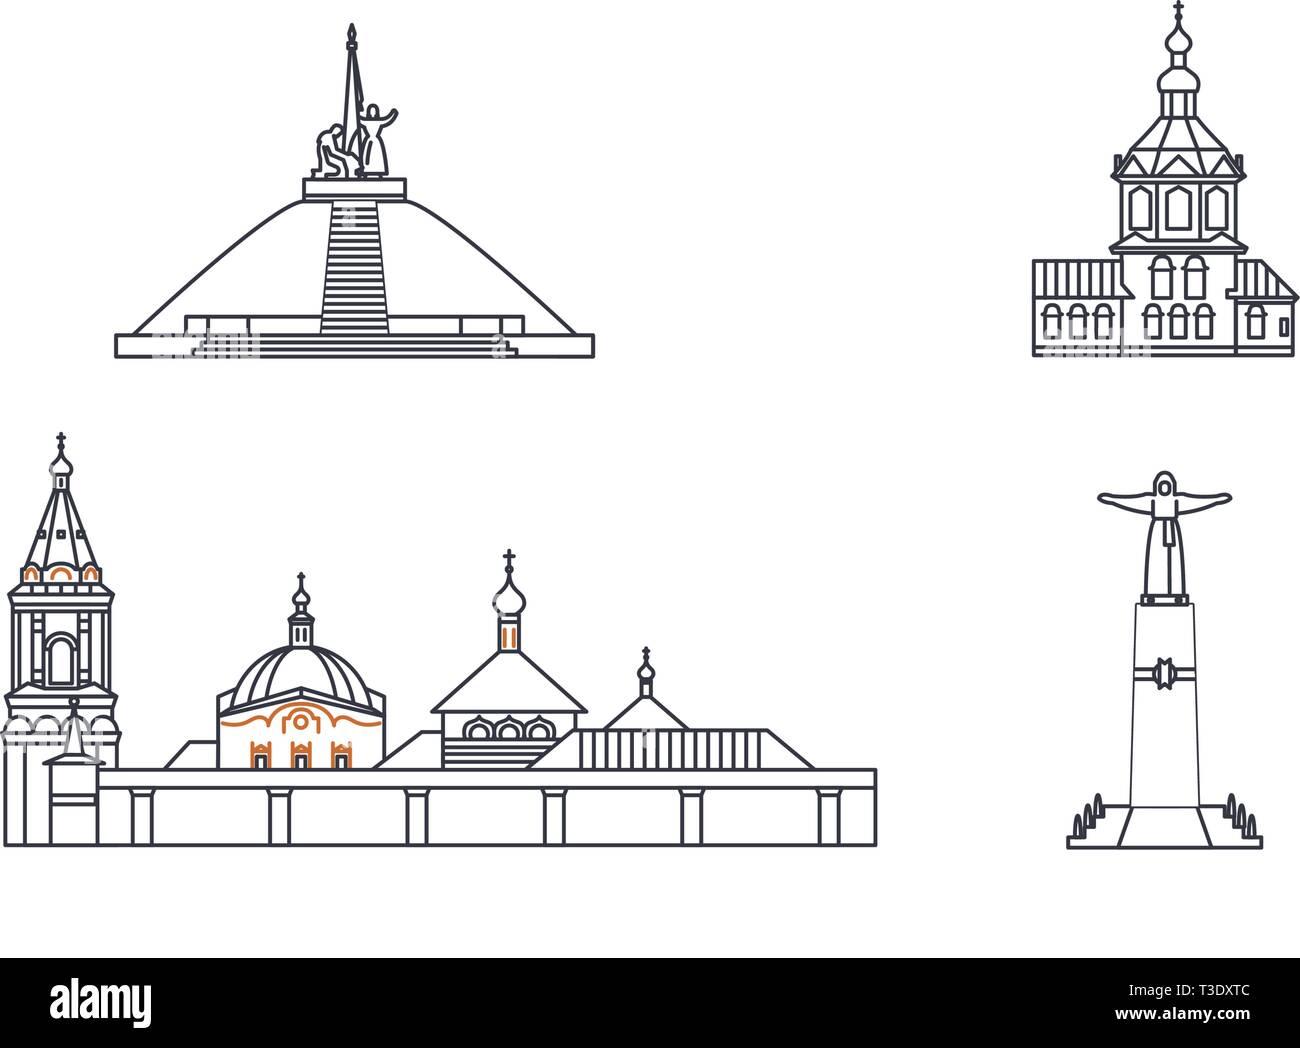 Russia, Cheboksary line travel skyline set. Russia, Cheboksary outline city vector illustration, symbol, travel sights, landmarks. - Stock Image